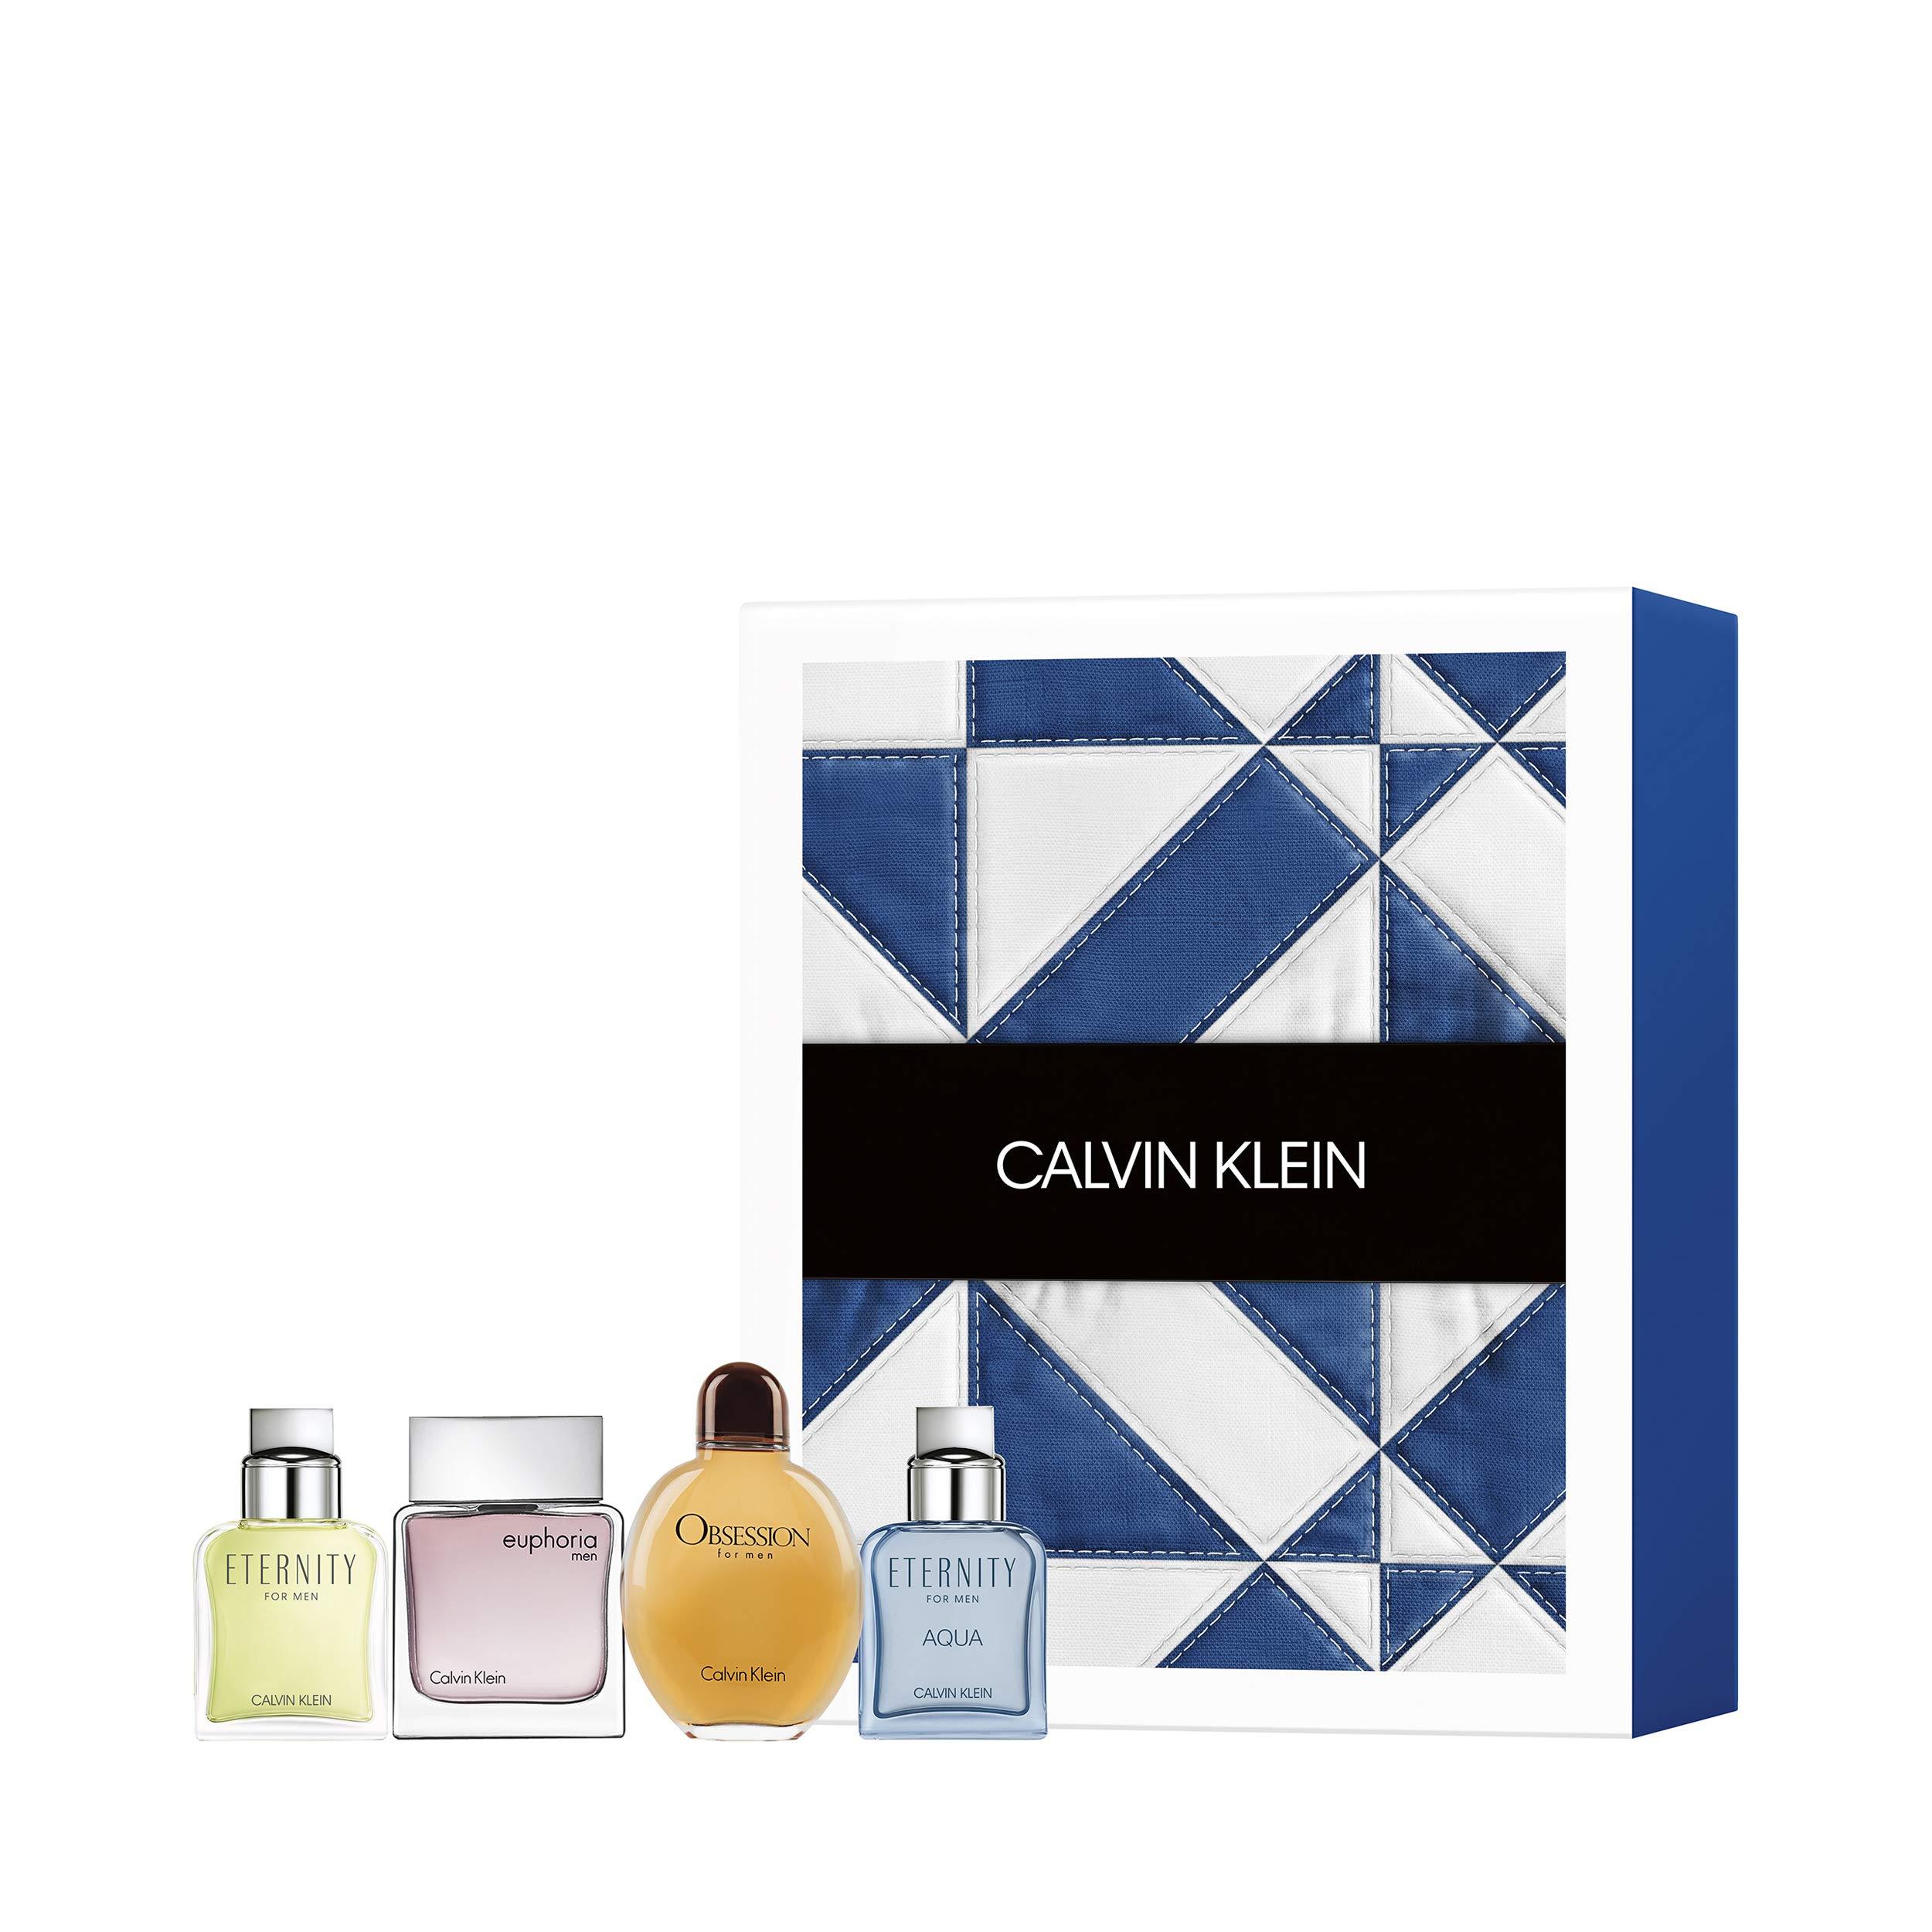 Calvin Klein Men's Coffret Giftset, 2.0 fl. oz. by Calvin Klein